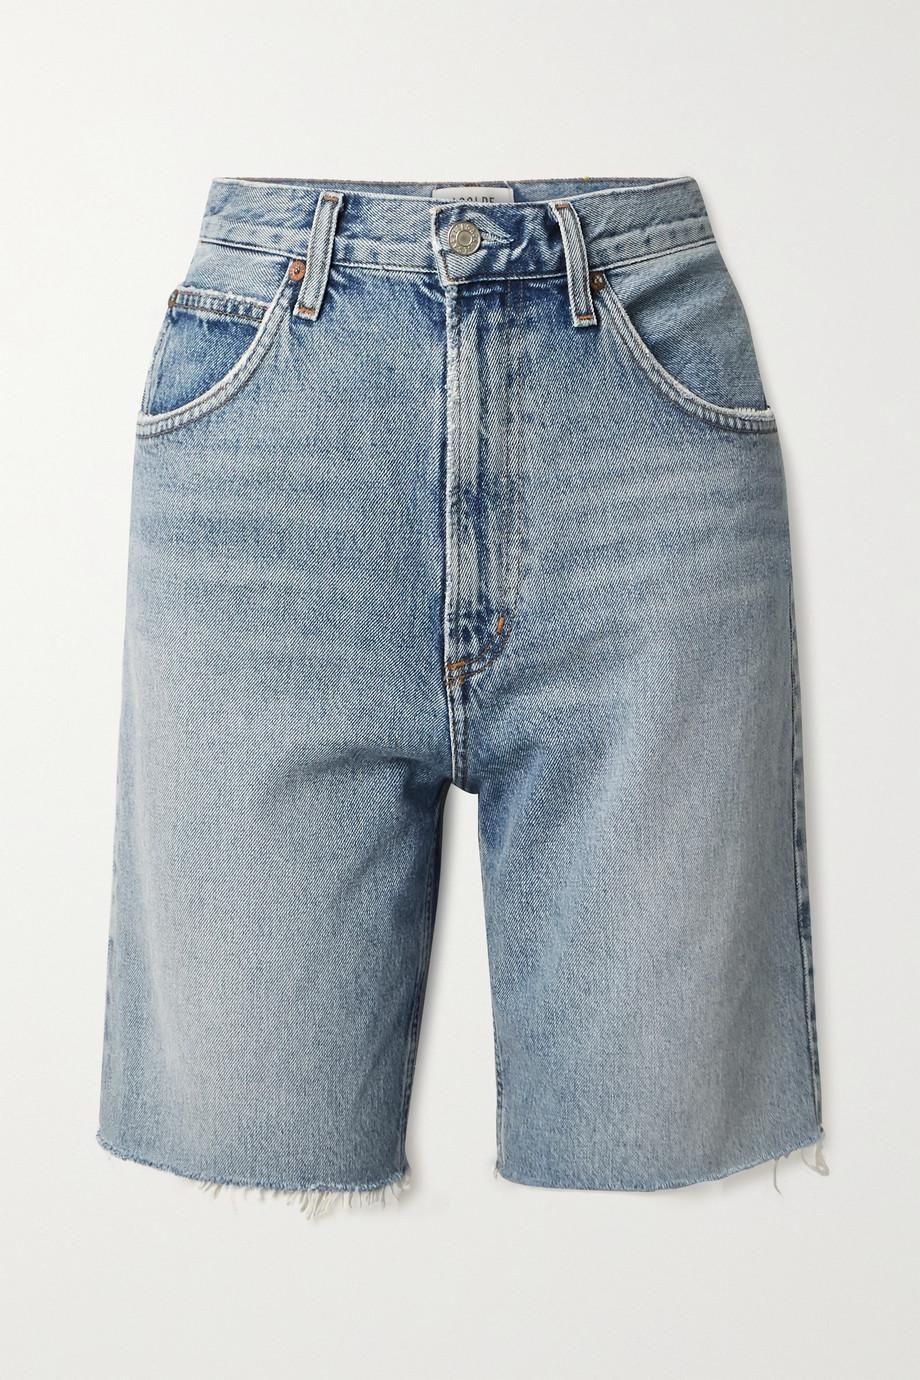 Pinch Distressed Organic Denim Shorts